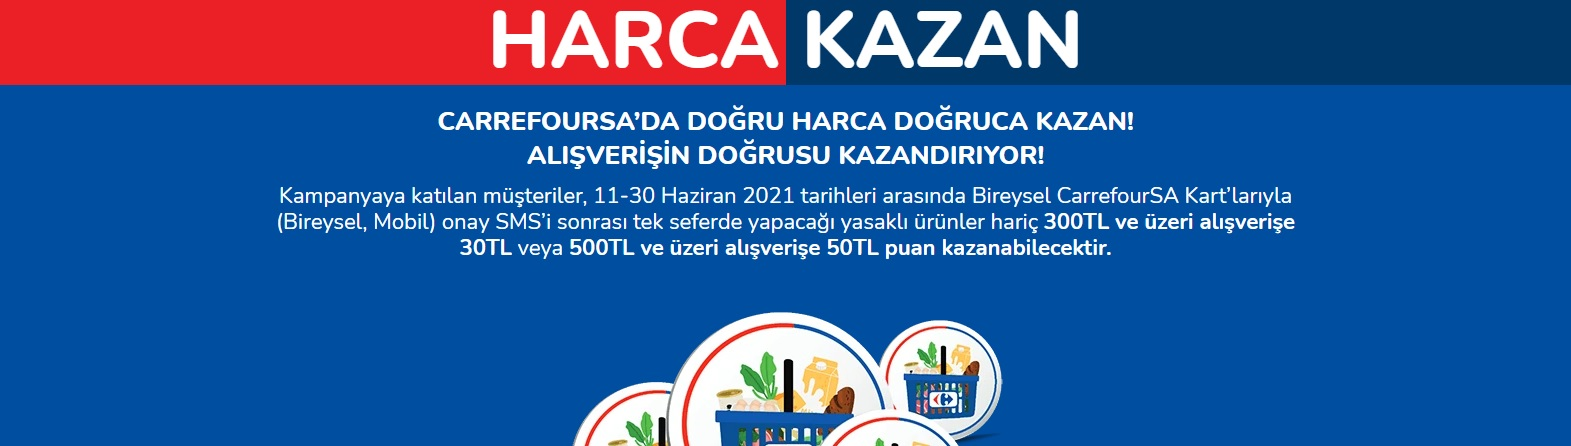 carrefoursa market kampanya fırsat 11 30 haziran harca kazan fırsatı